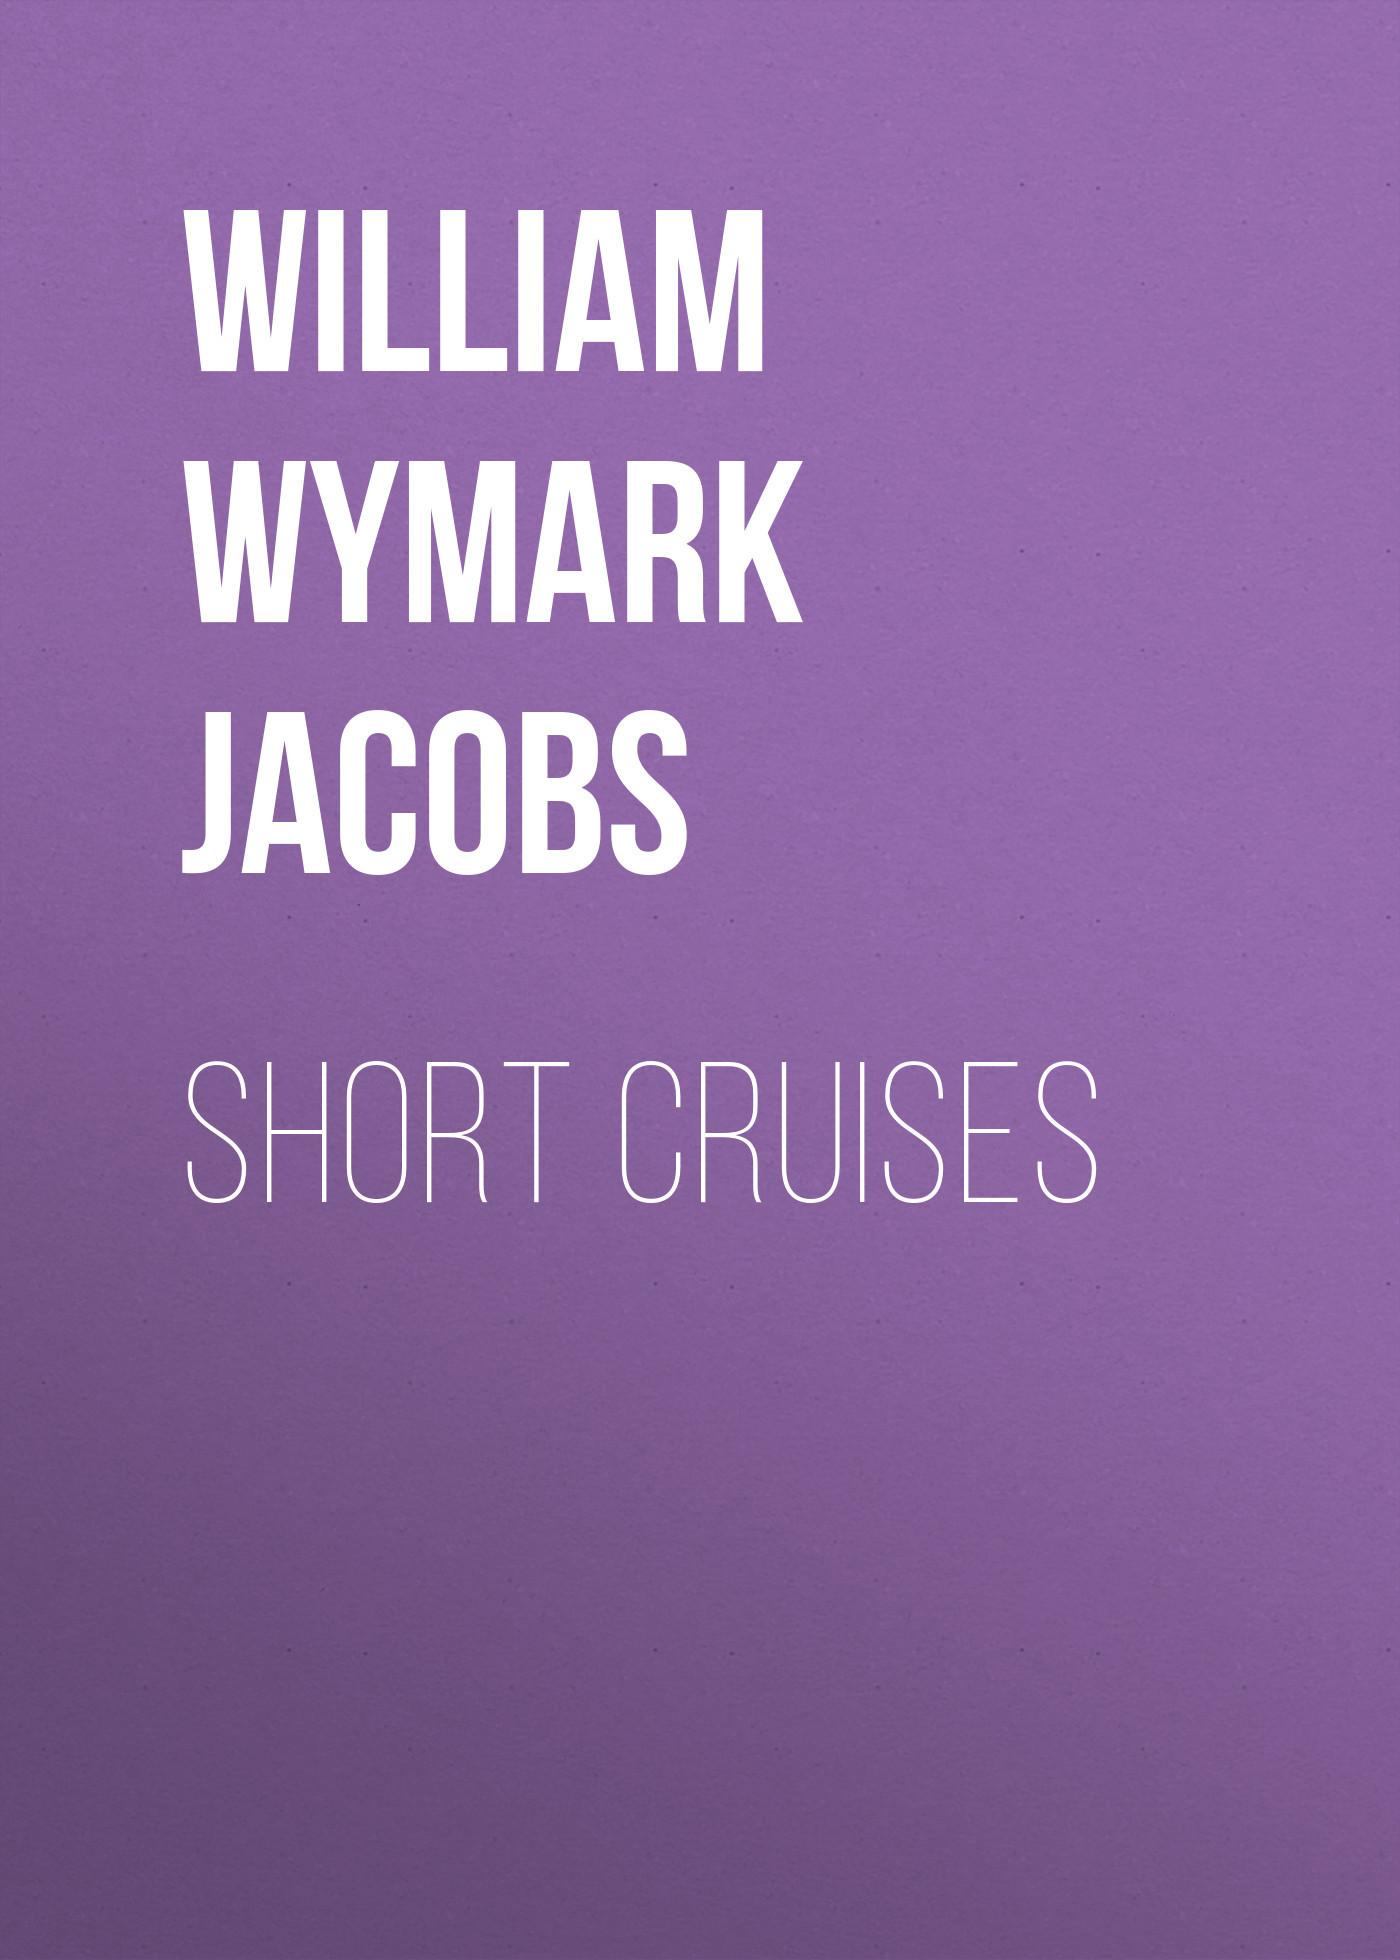 William Wymark Jacobs Short Cruises 2017 new winter fashion women down jacket hooded thick super warm medium long female coat long sleeve slim big yards parkas nz18